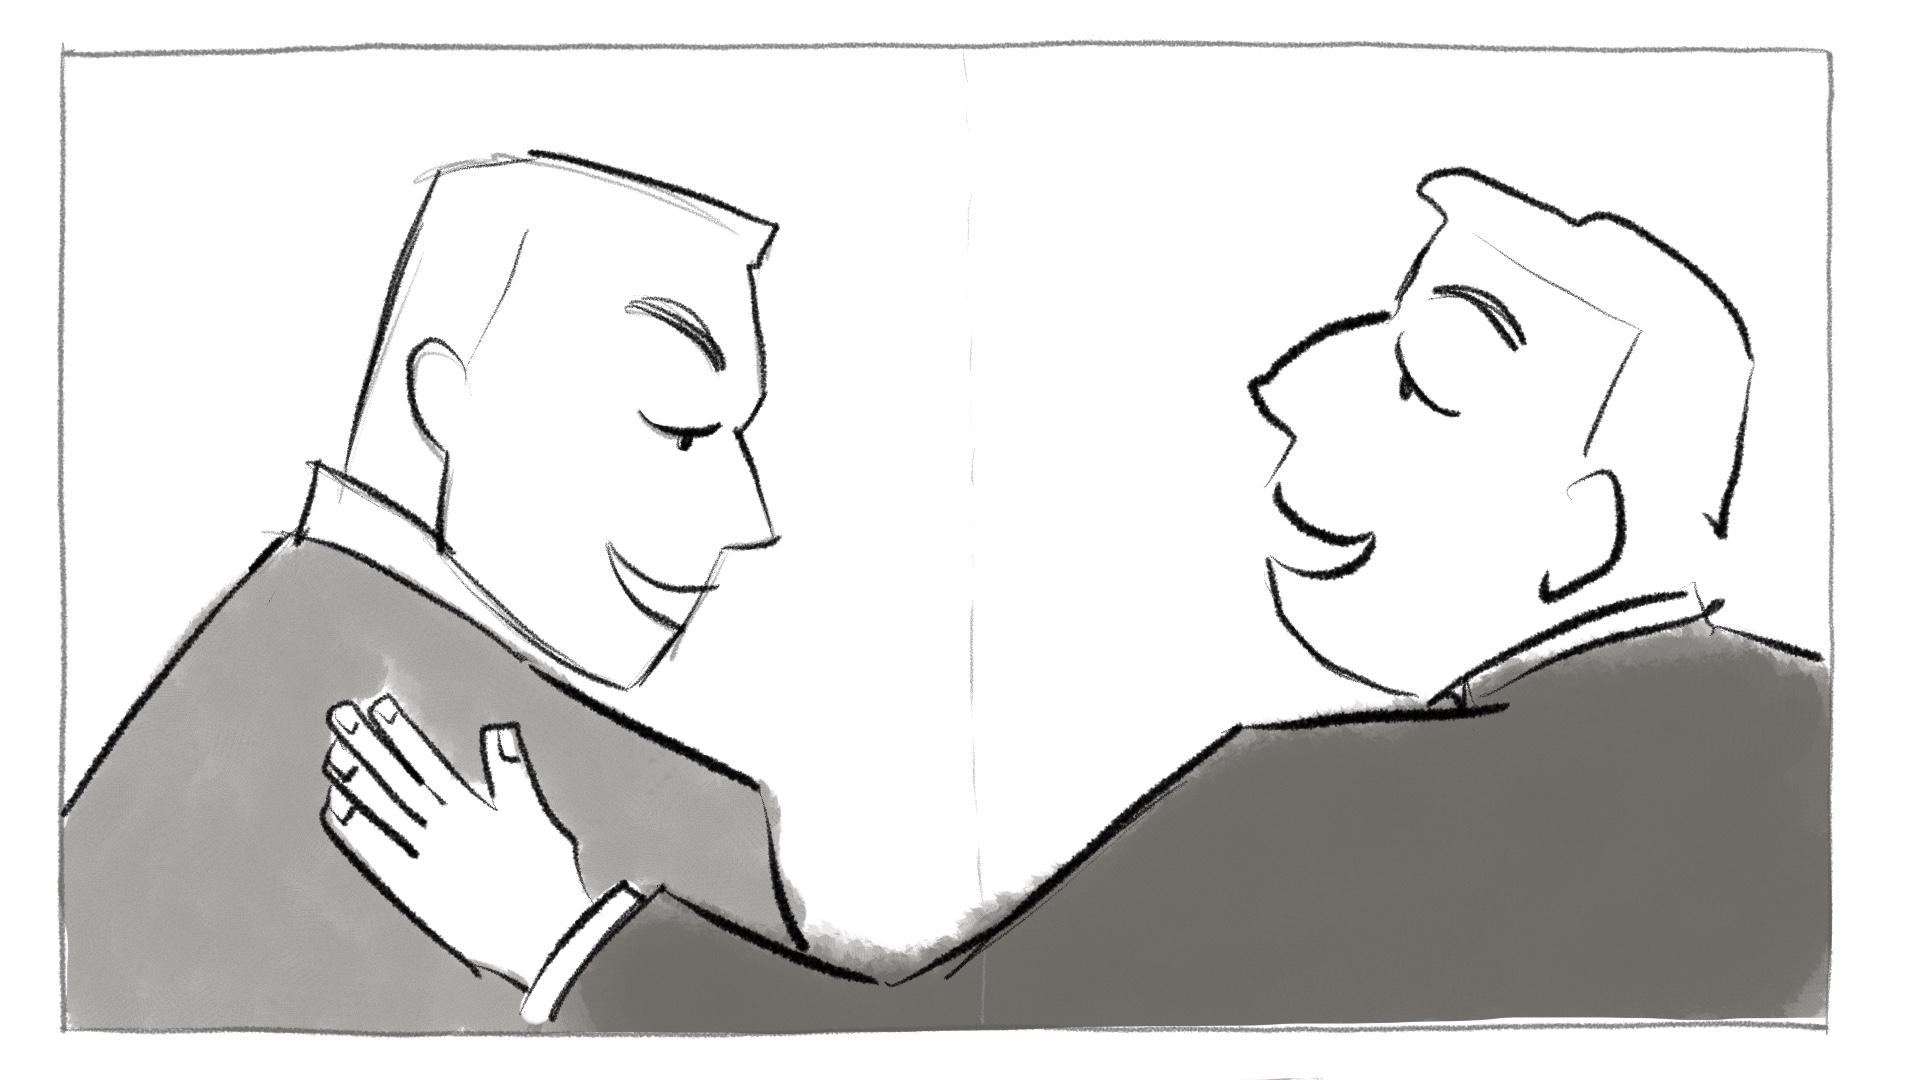 Shahidi_Storyboards_4c-4.jpg